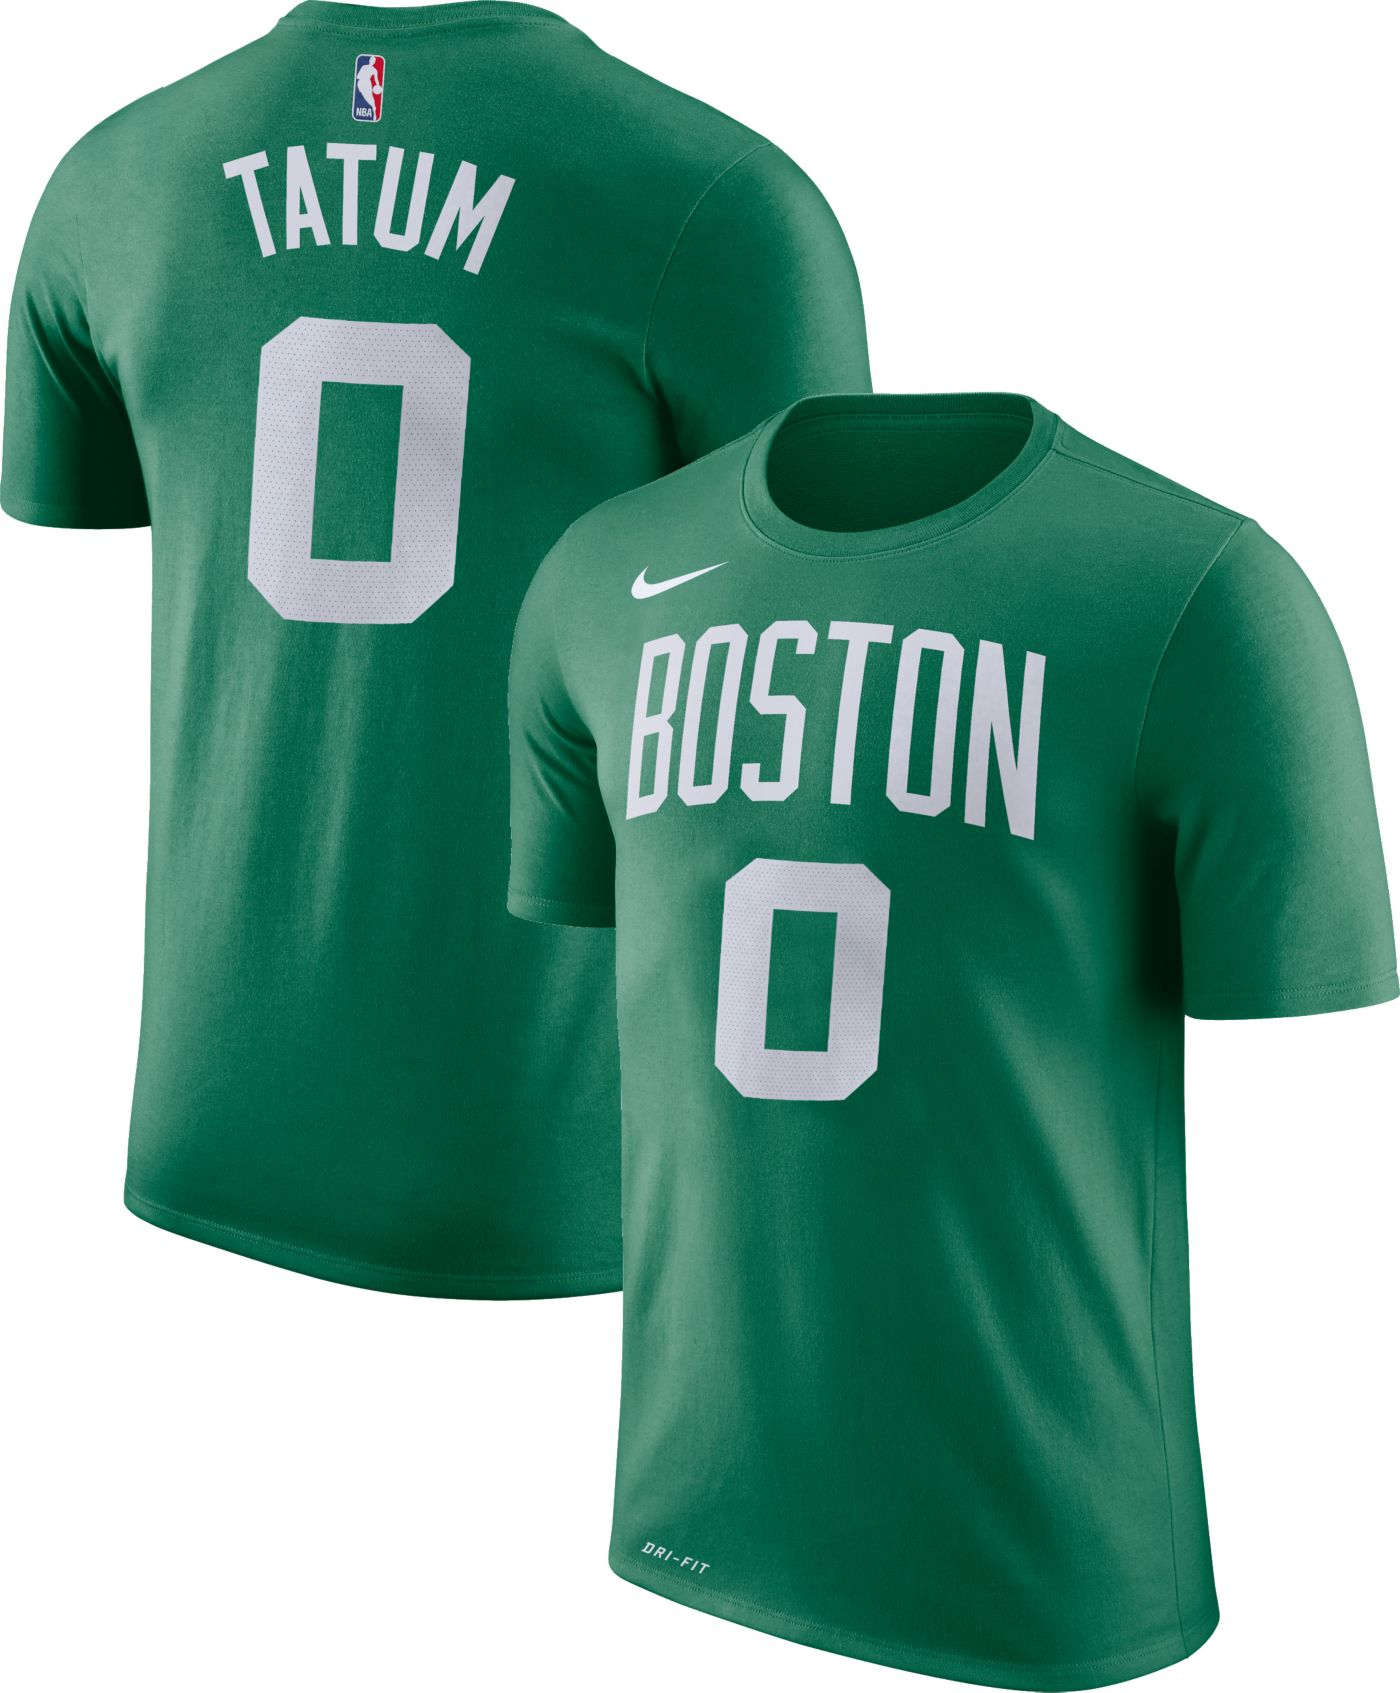 Nike Youth Boston Celtics Jayson Tatum #0 Dri-FIT Kelly Green T-Shirt